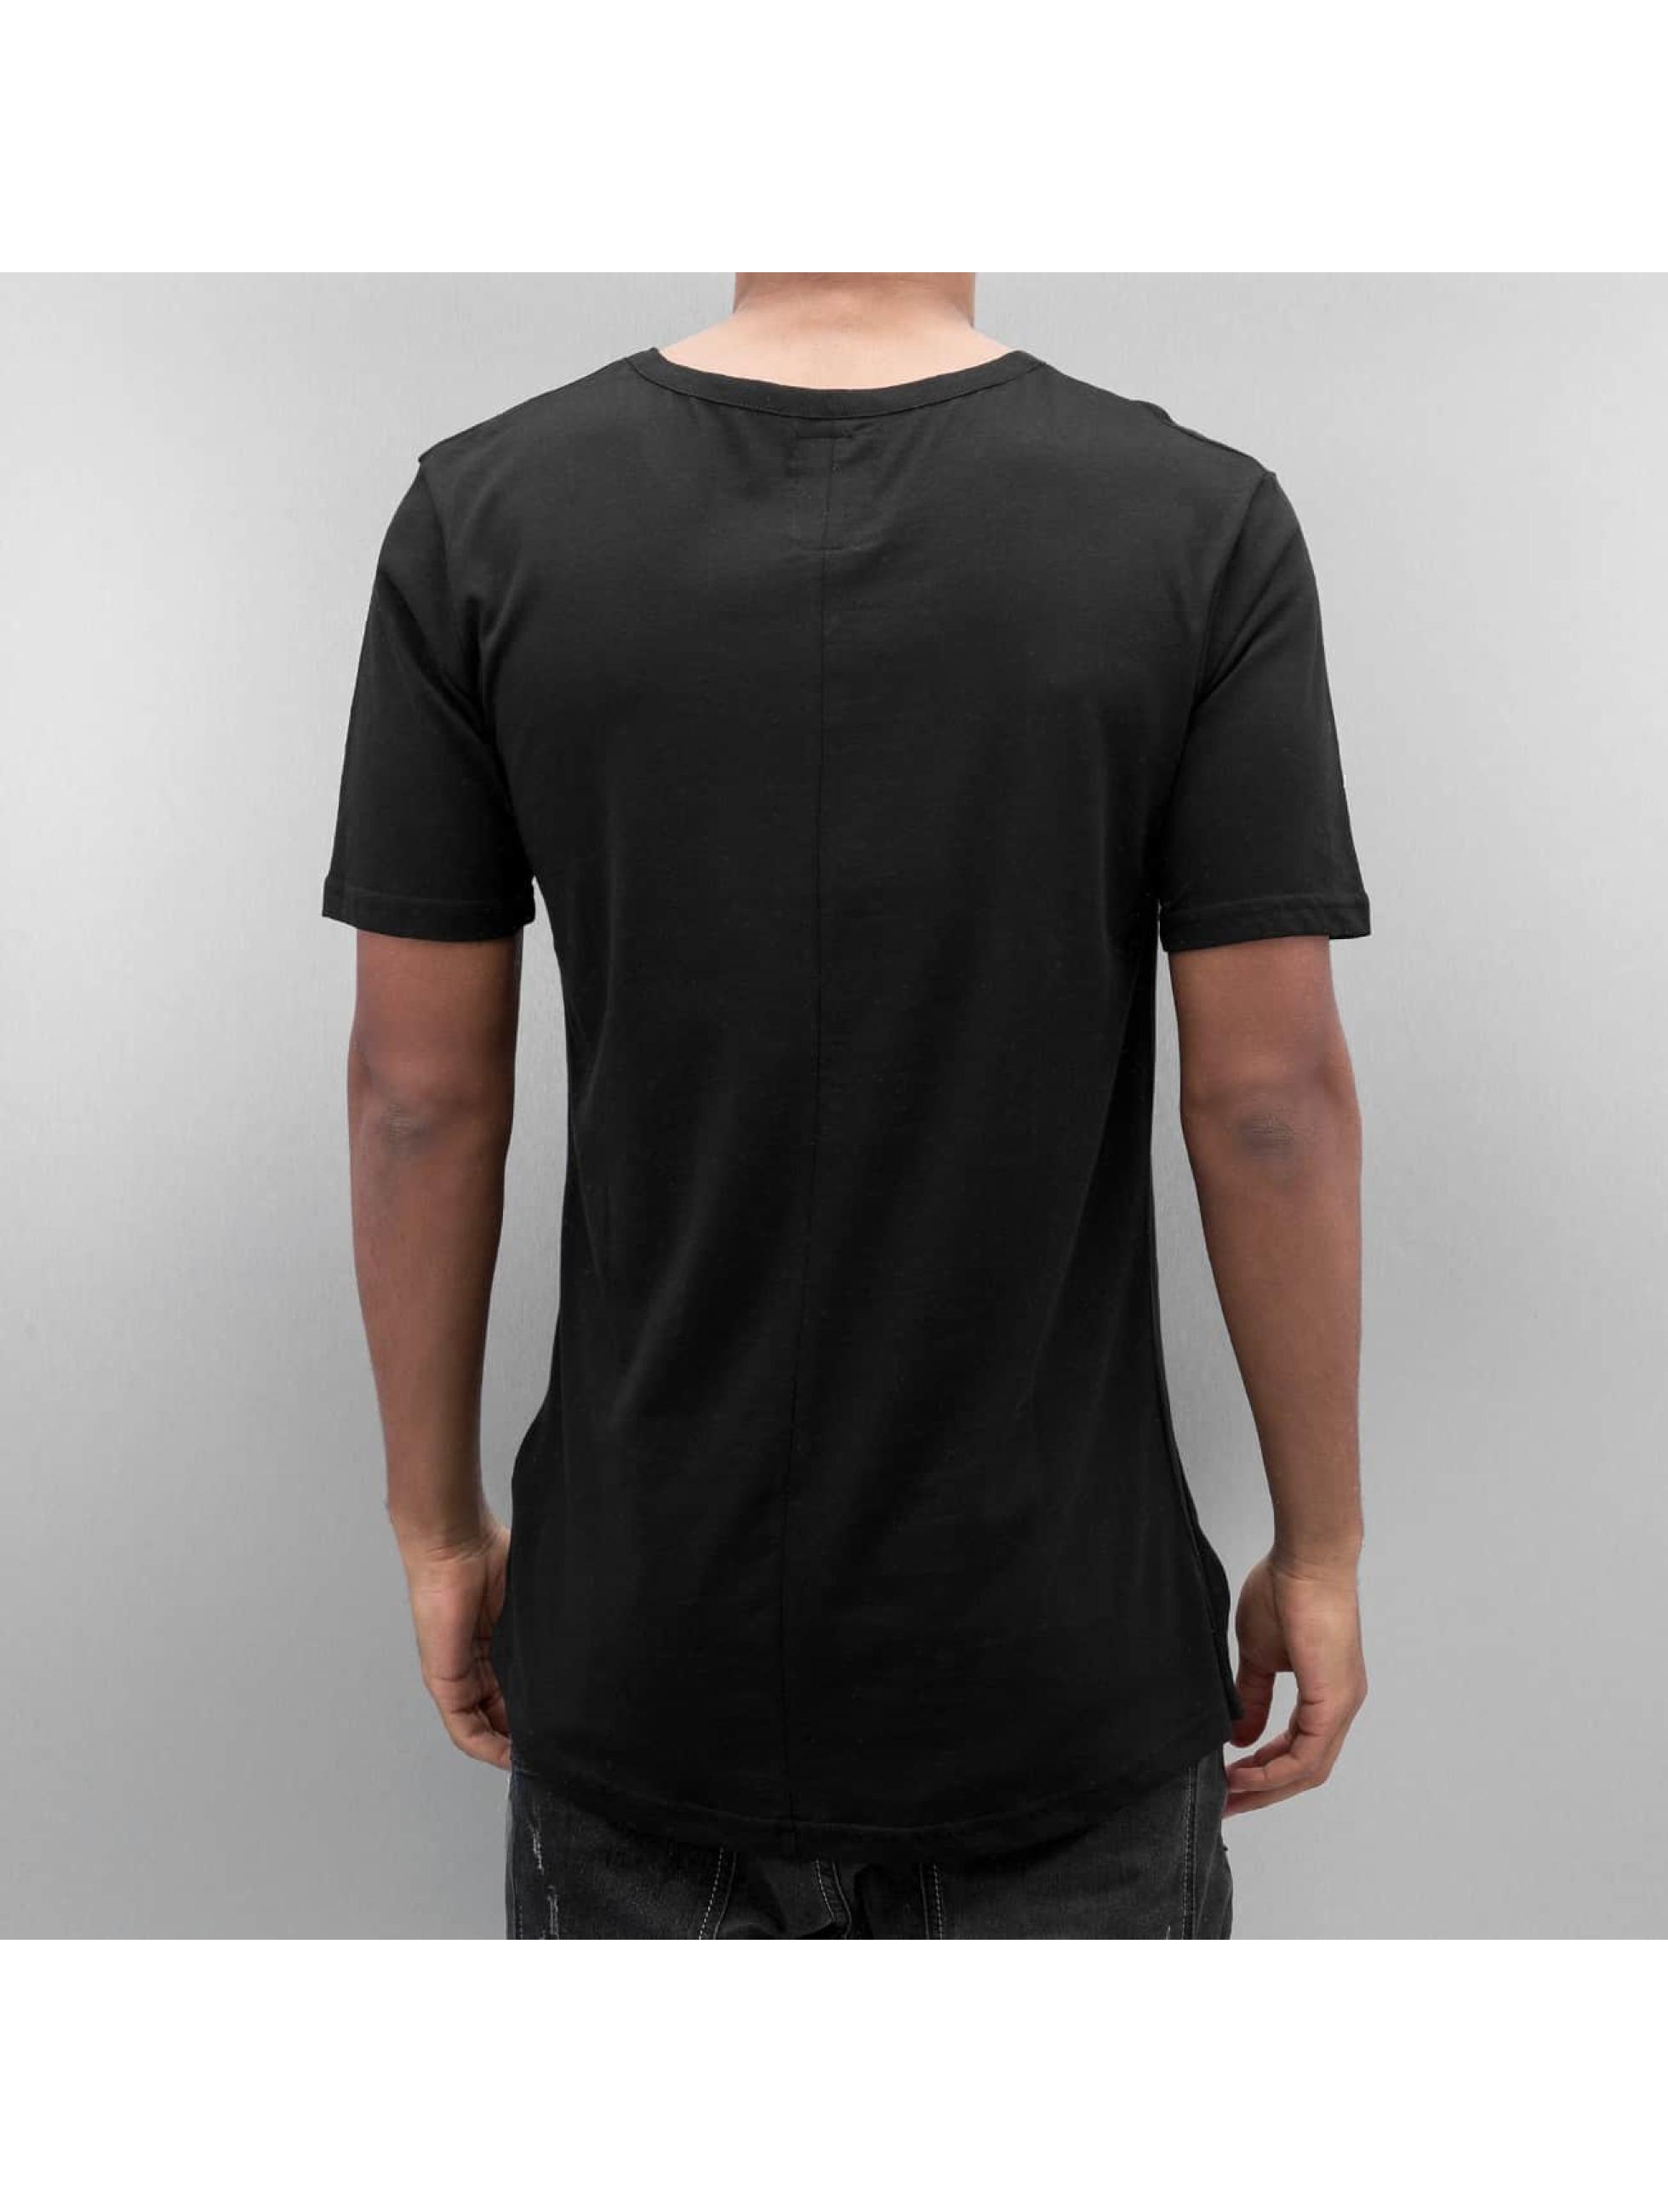 Bangastic-Uomini-Maglieria-T-shirt-Ben